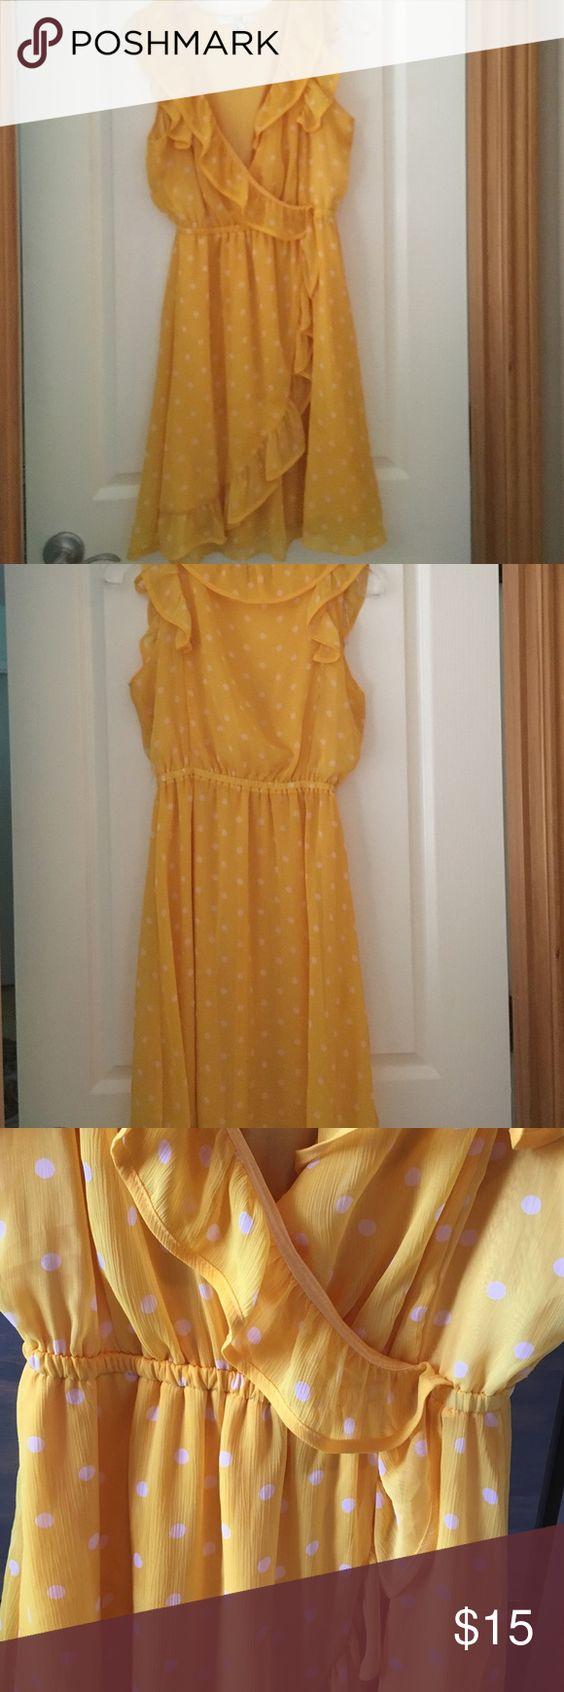 Sunshine yellow polka dot sun dress Cheery and girly polka dot dress. Has cute flounce all around collar and crosses skirt part. Forever 21 Dresses Mini